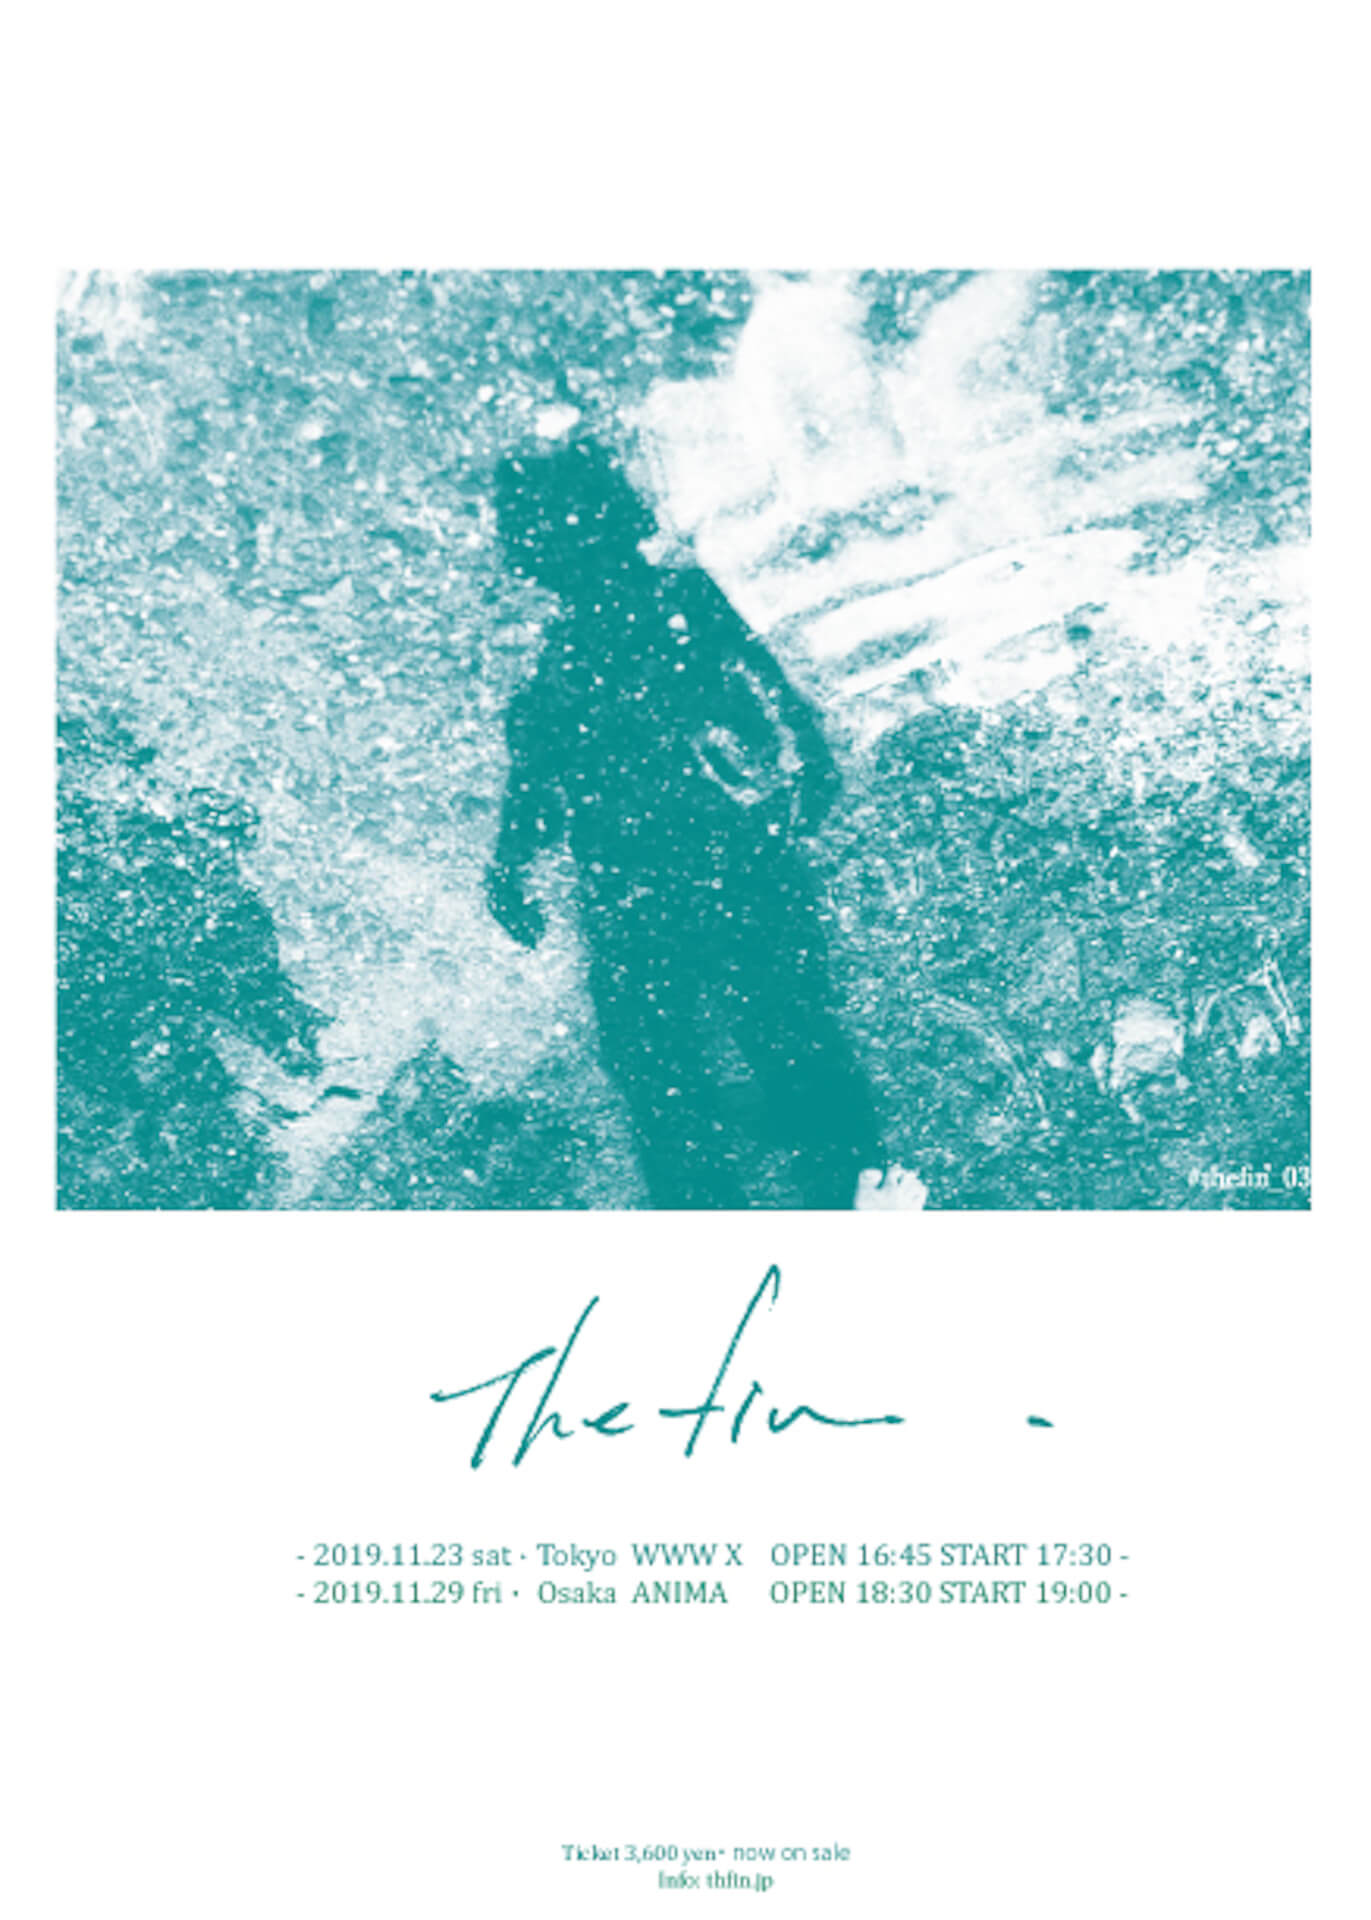 The fin.インタビュー|Yuto Uchinoが作る、世界中の人たちとシェアすることができる音楽 music190816thefin_5